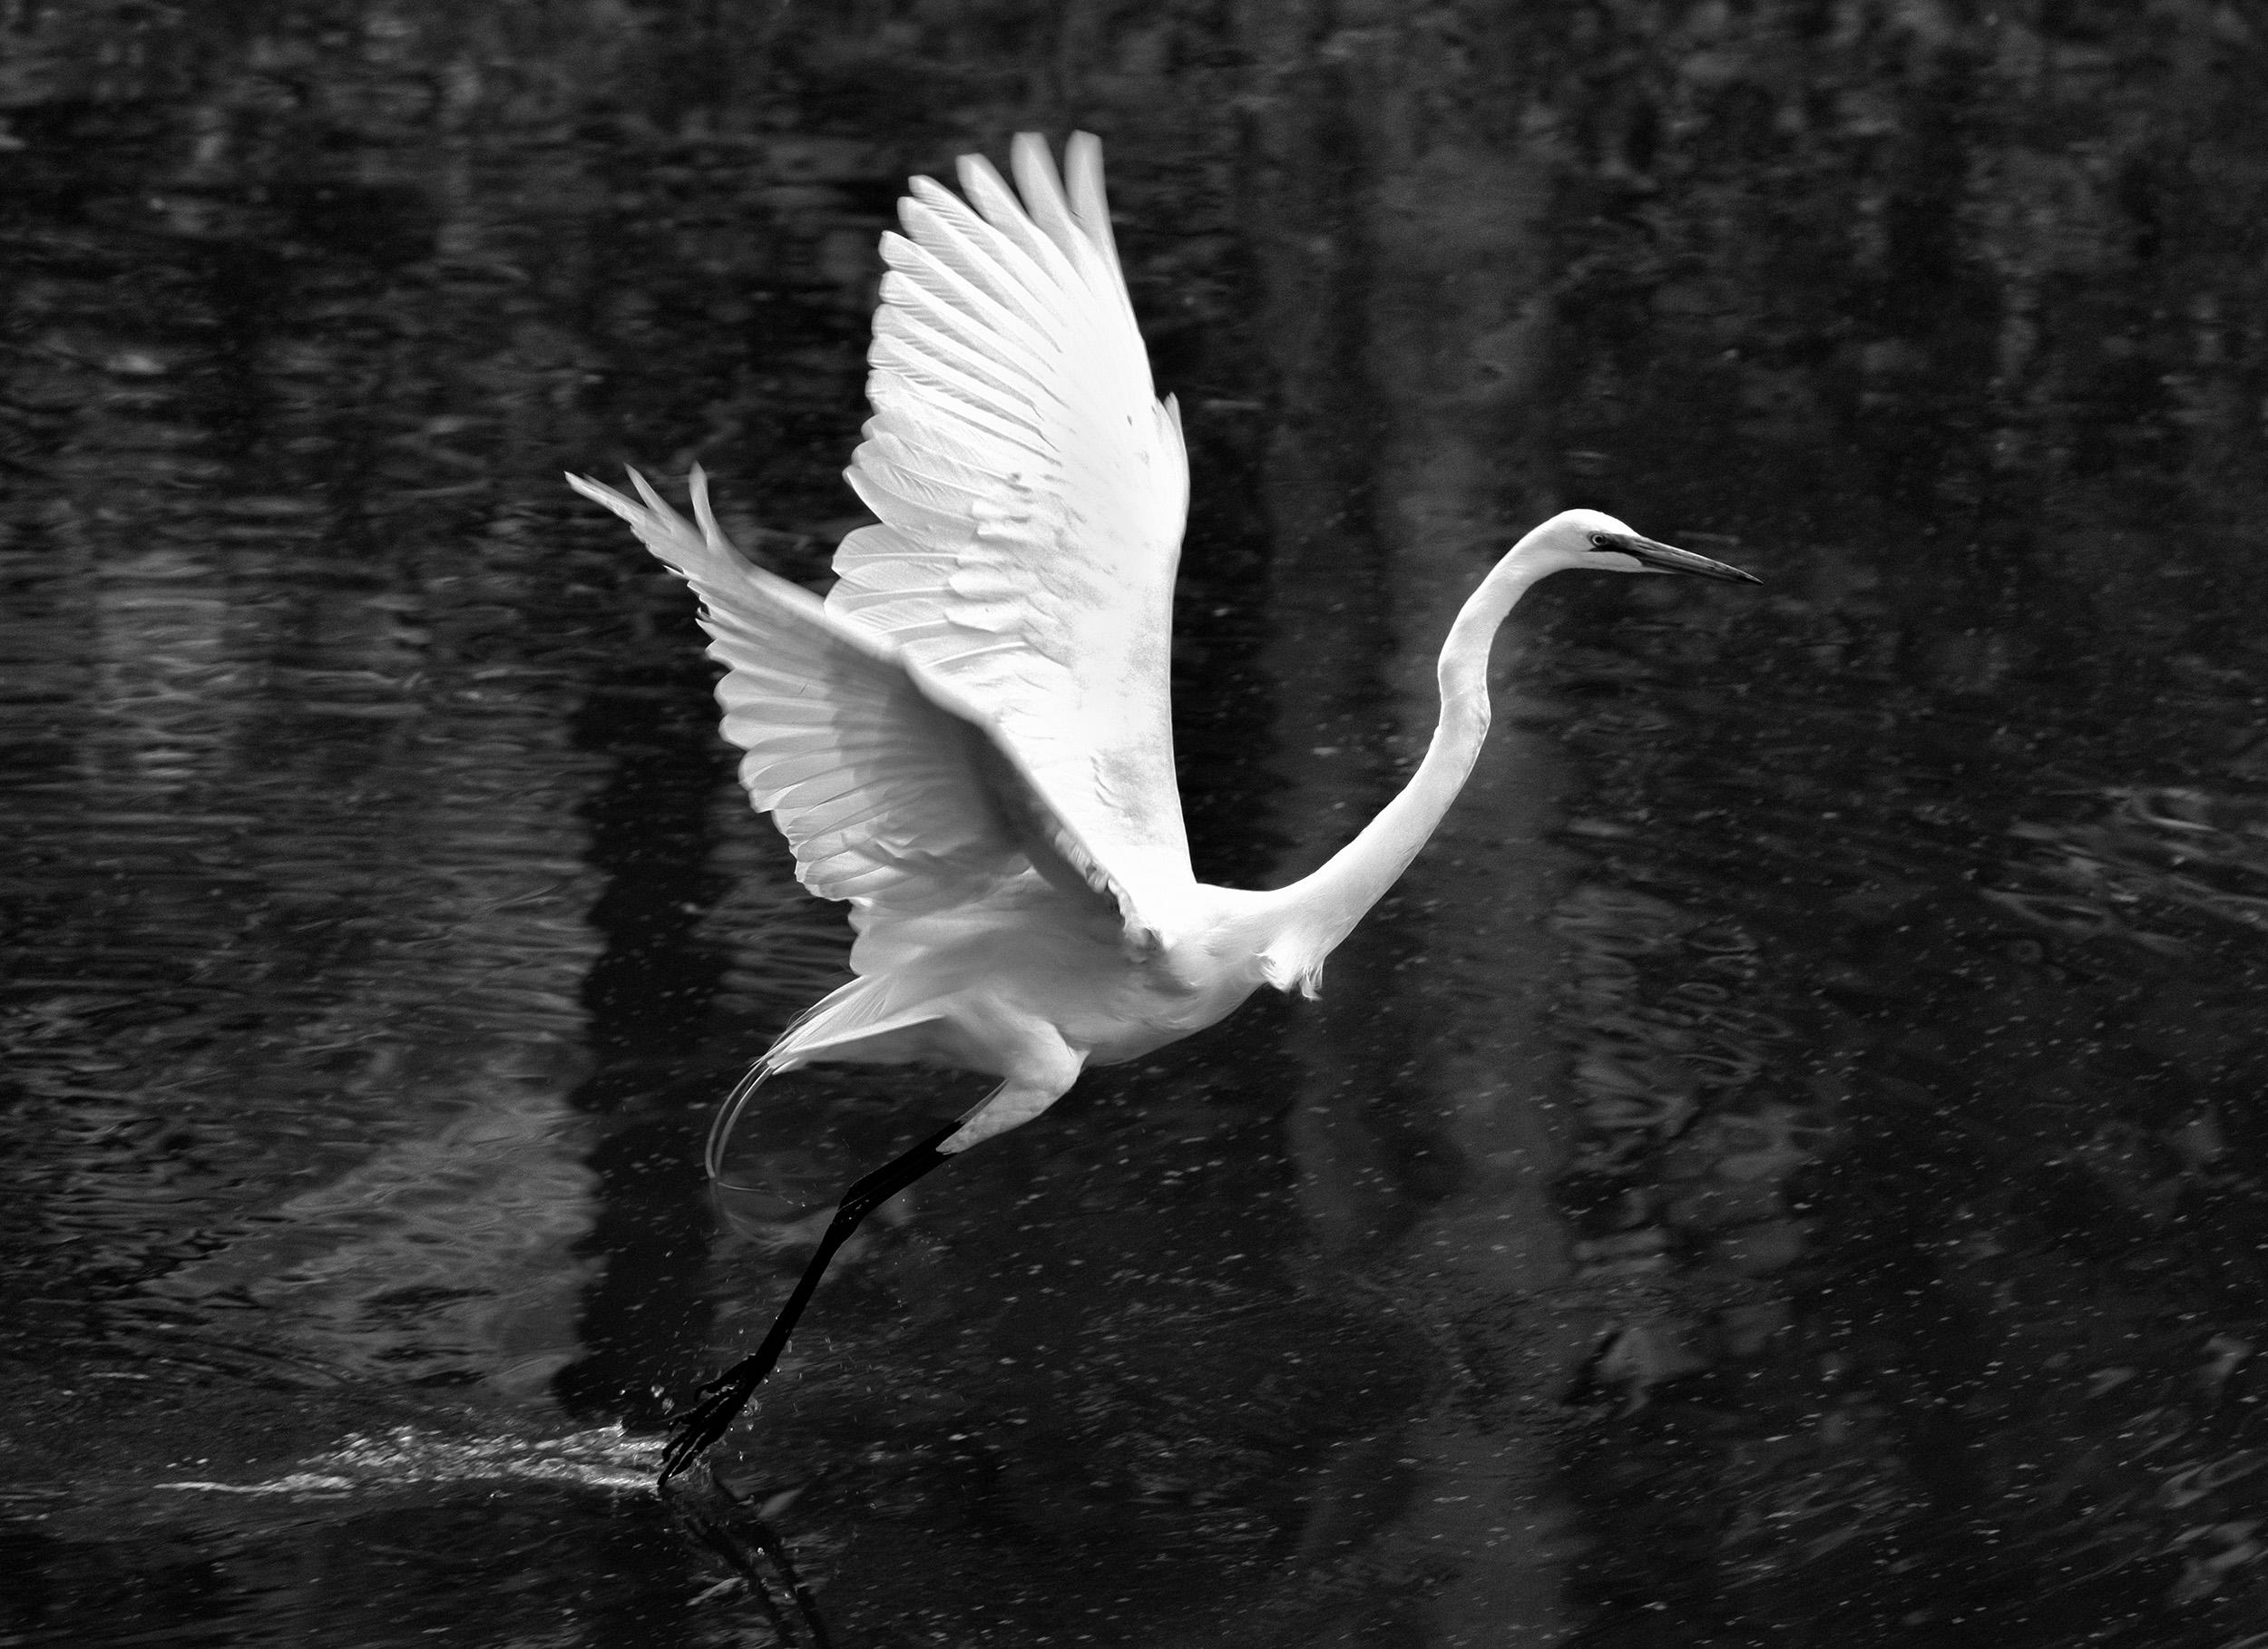 190514 XT2 Canal Birds  109-1 bw cln.jpg